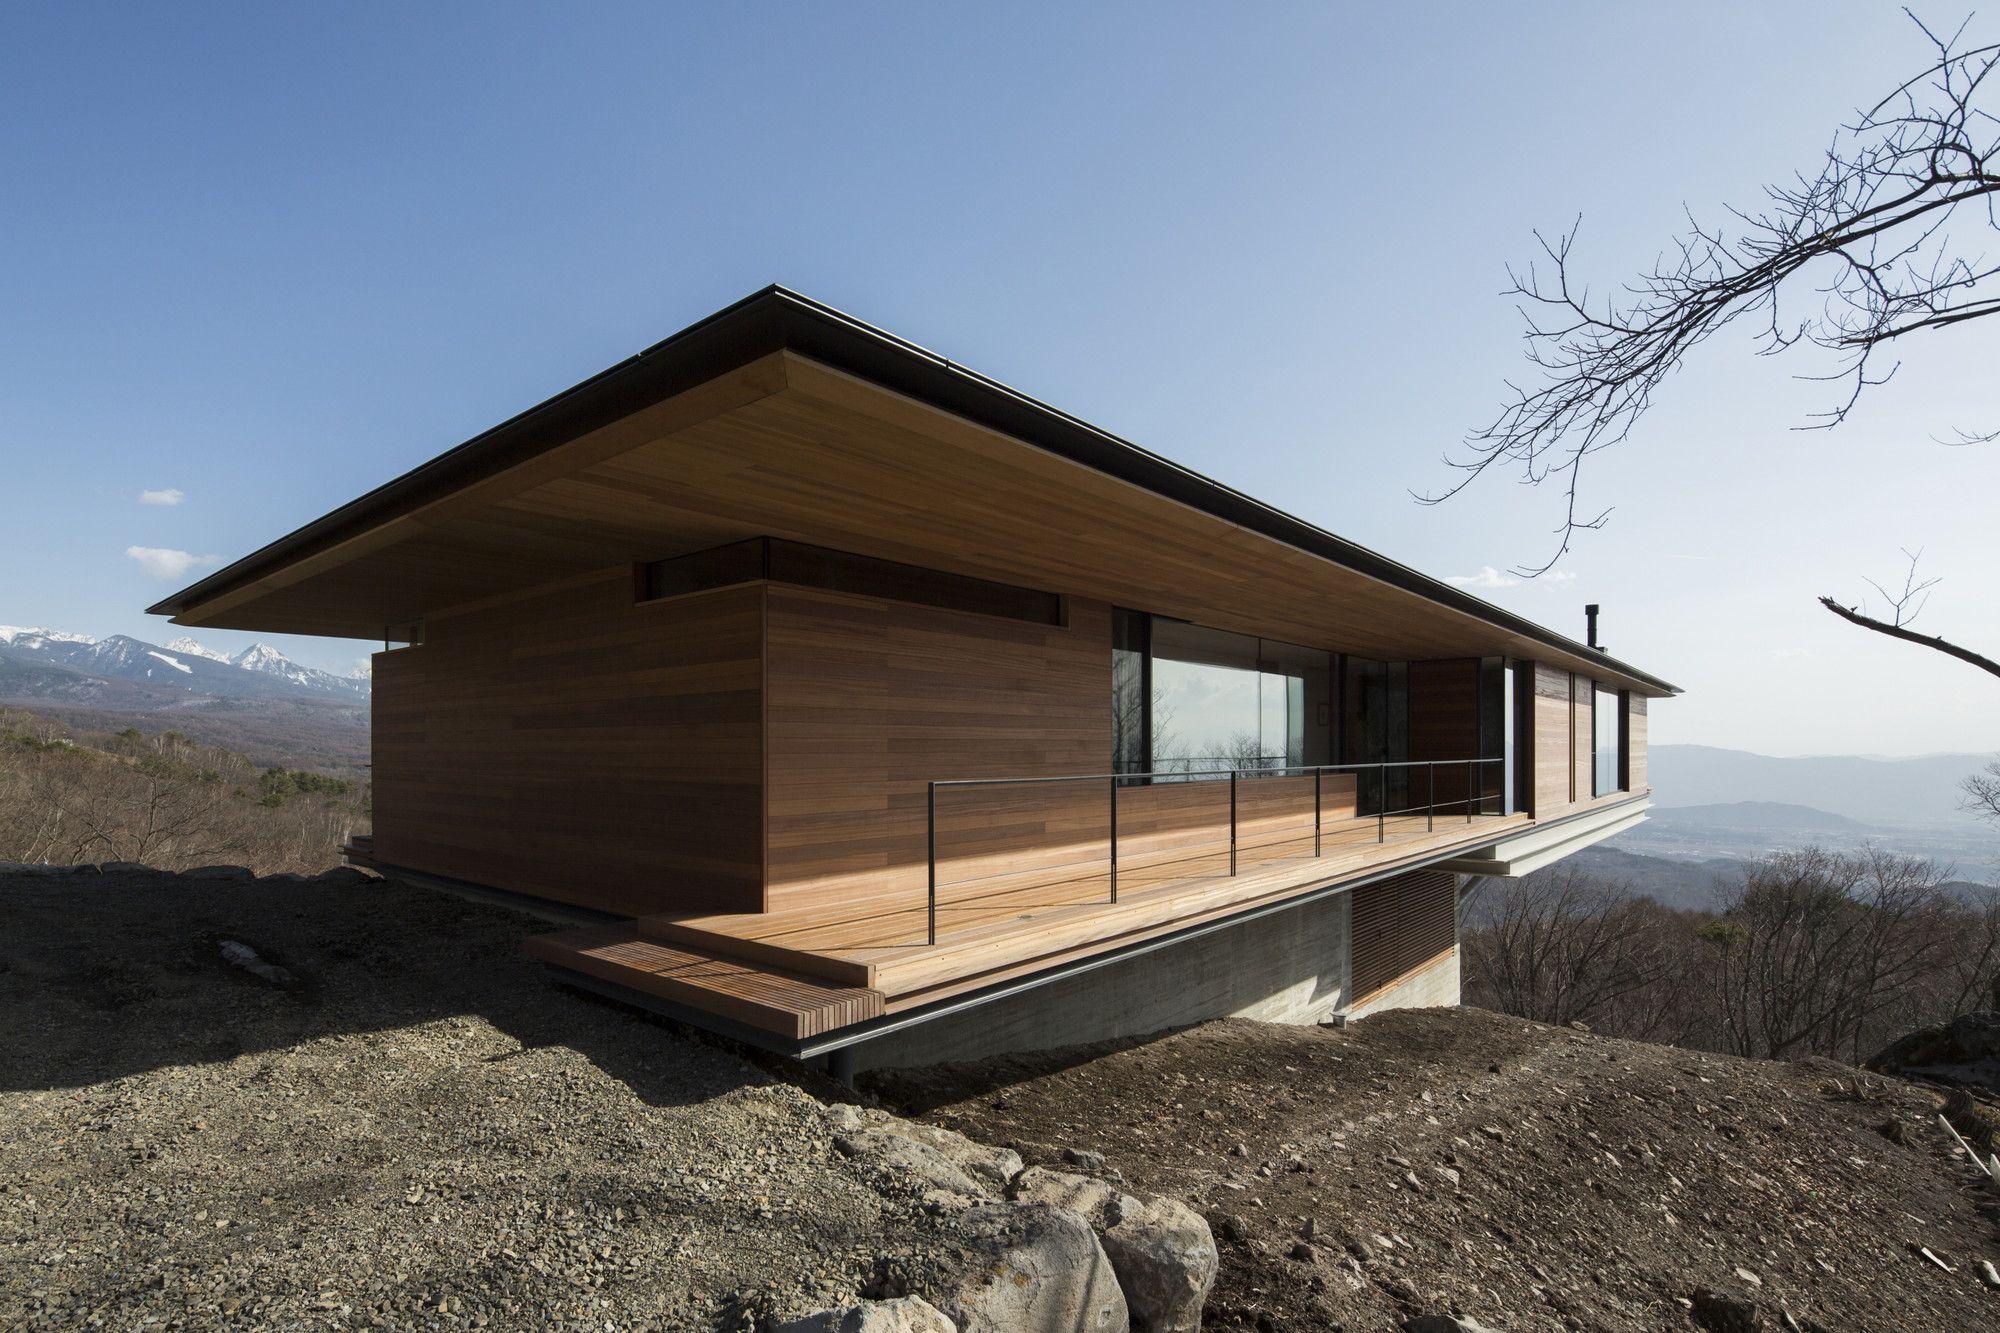 Borja Garcia Studio U2013 HOUSE IN GODELLA | Structure | Pinterest |  Architecture And House